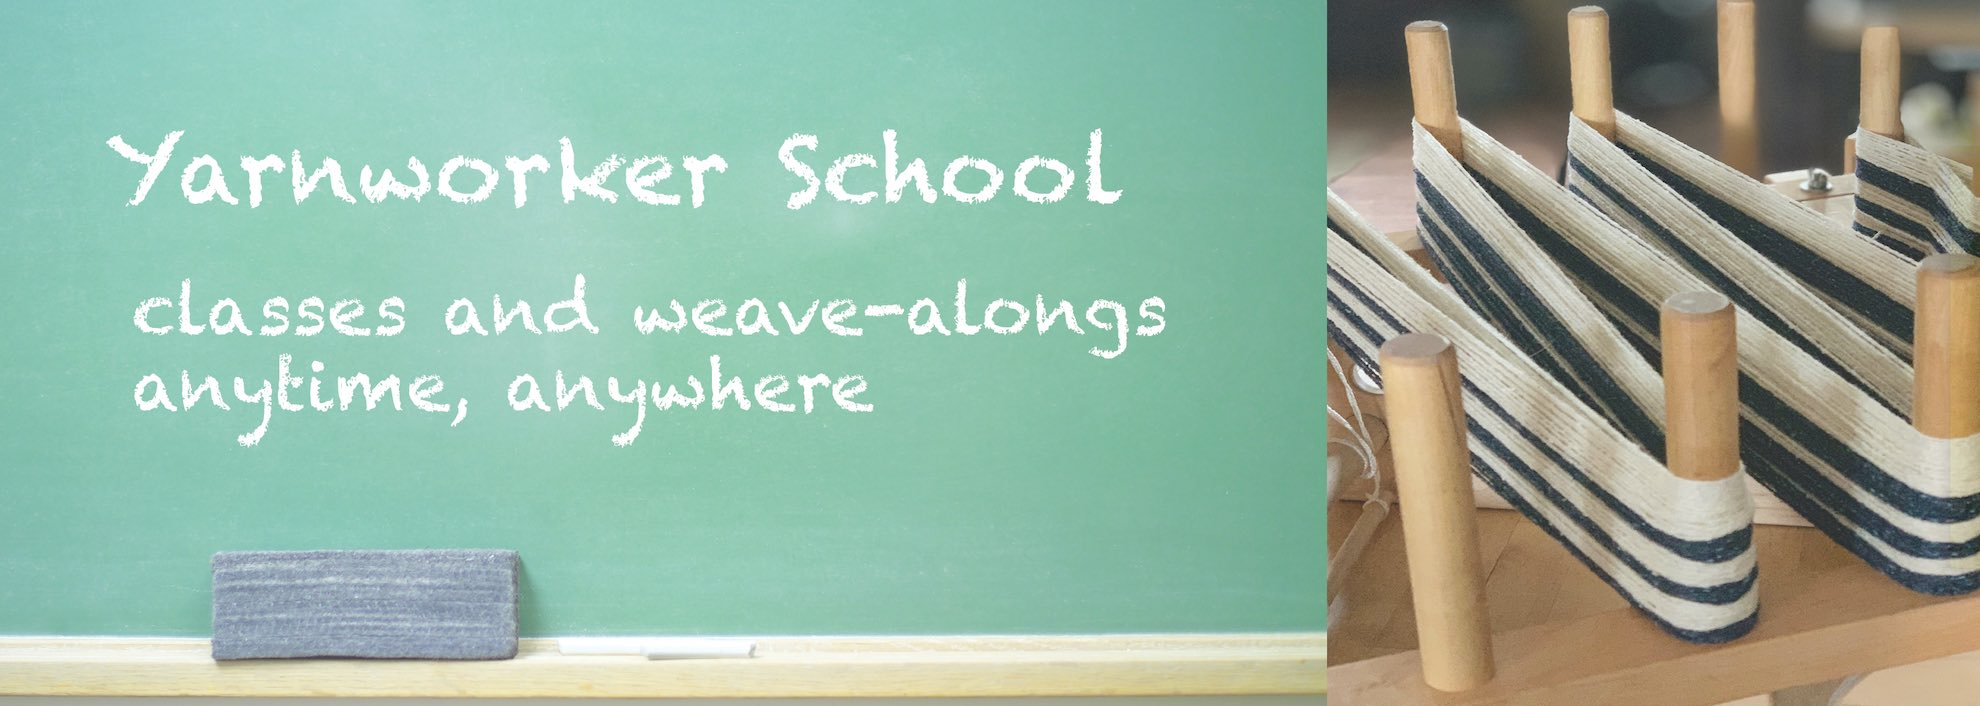 Yarnworker School